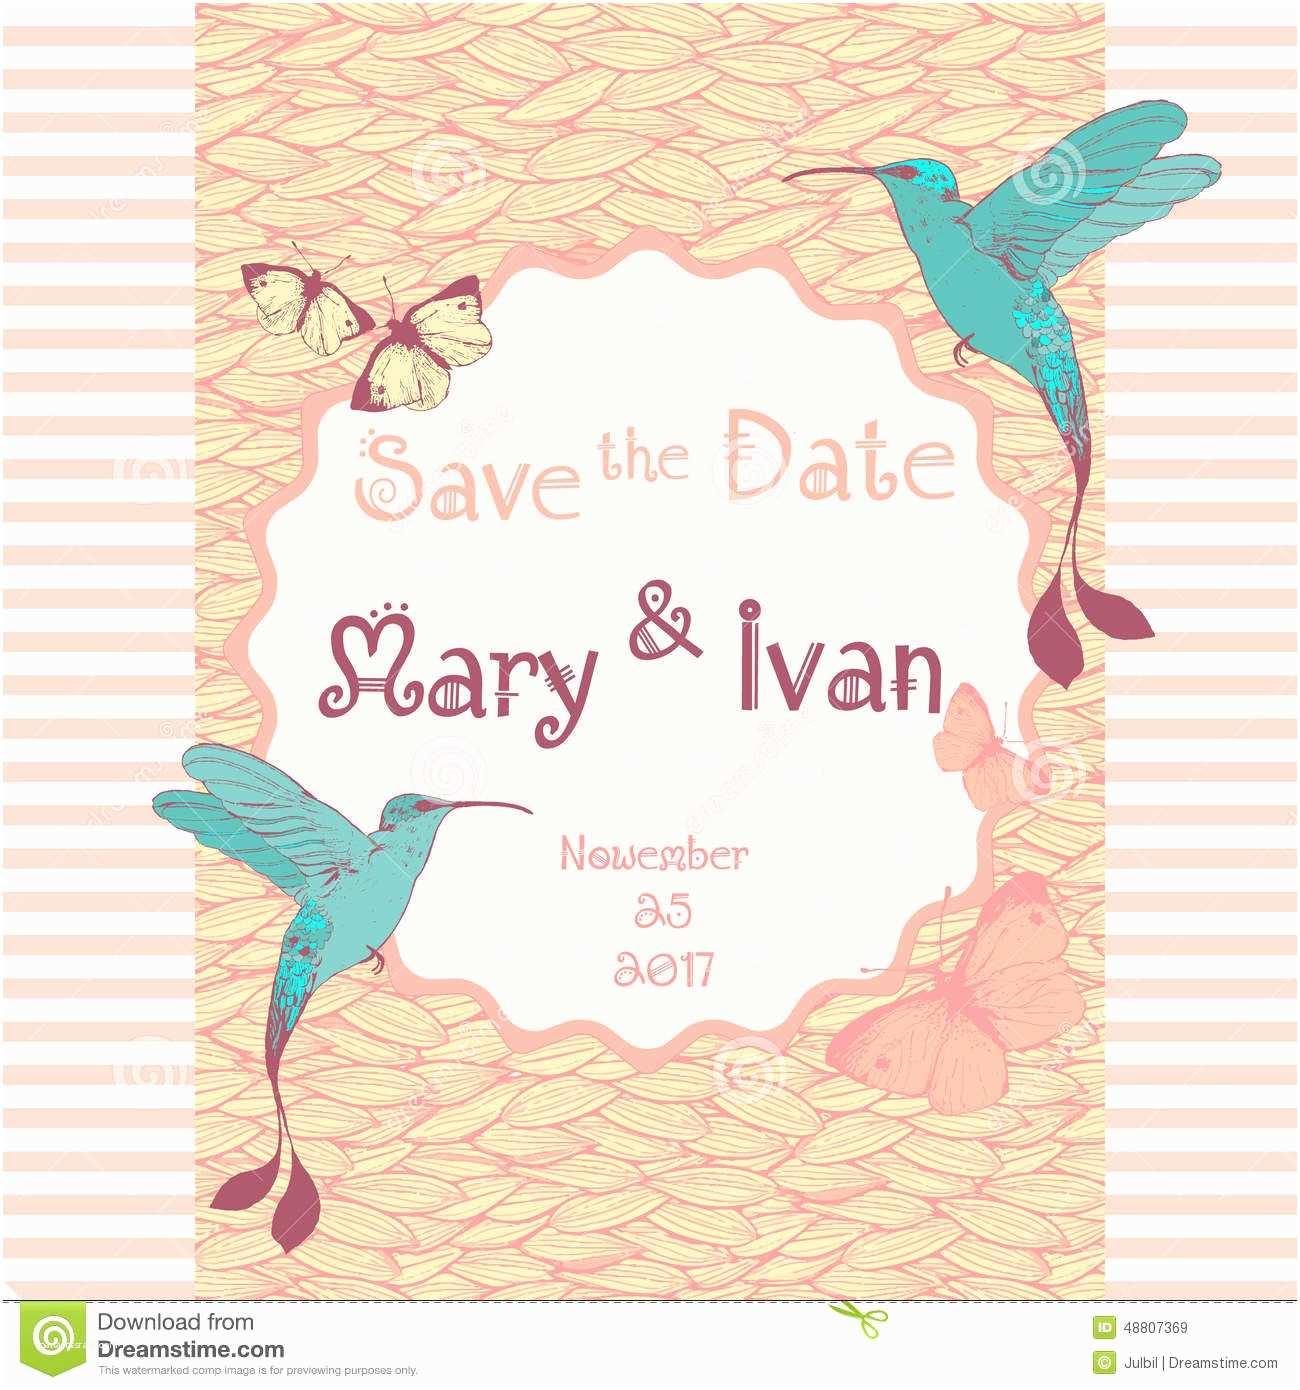 Online Editable Wedding Invitation Cards Free Download Wedding Invitation Card Editable With Background